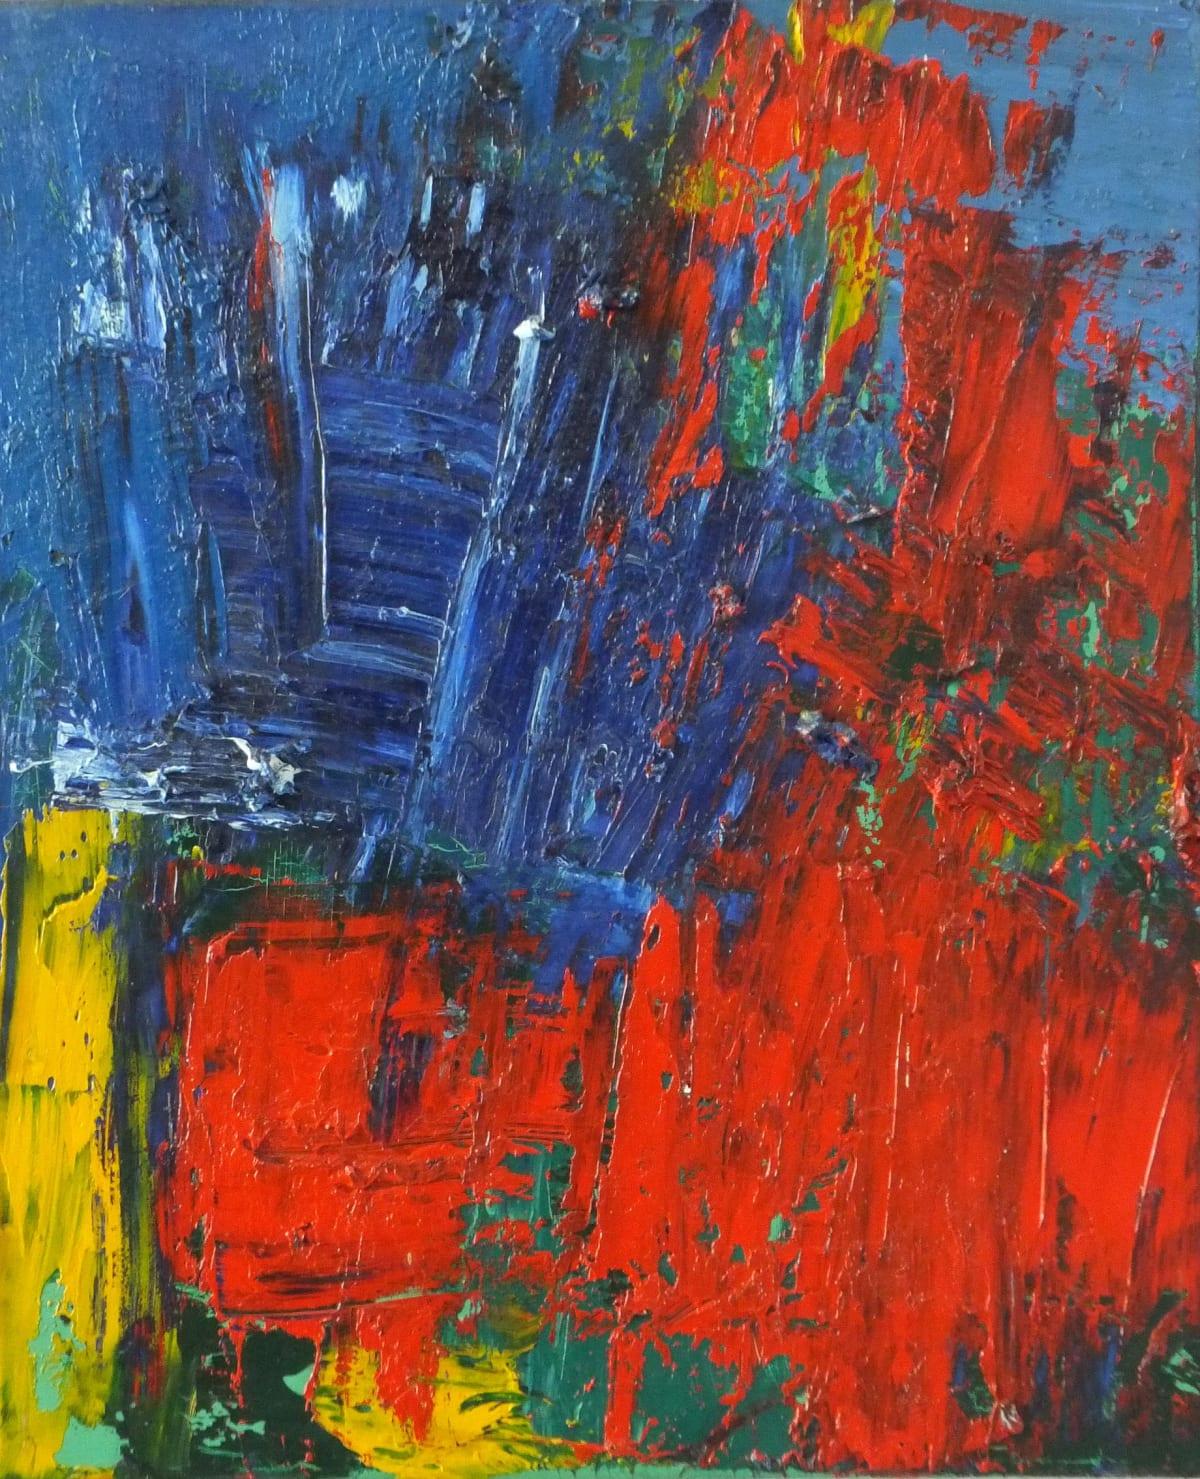 Martyn Brewster, Untitled (Variation series), 1987